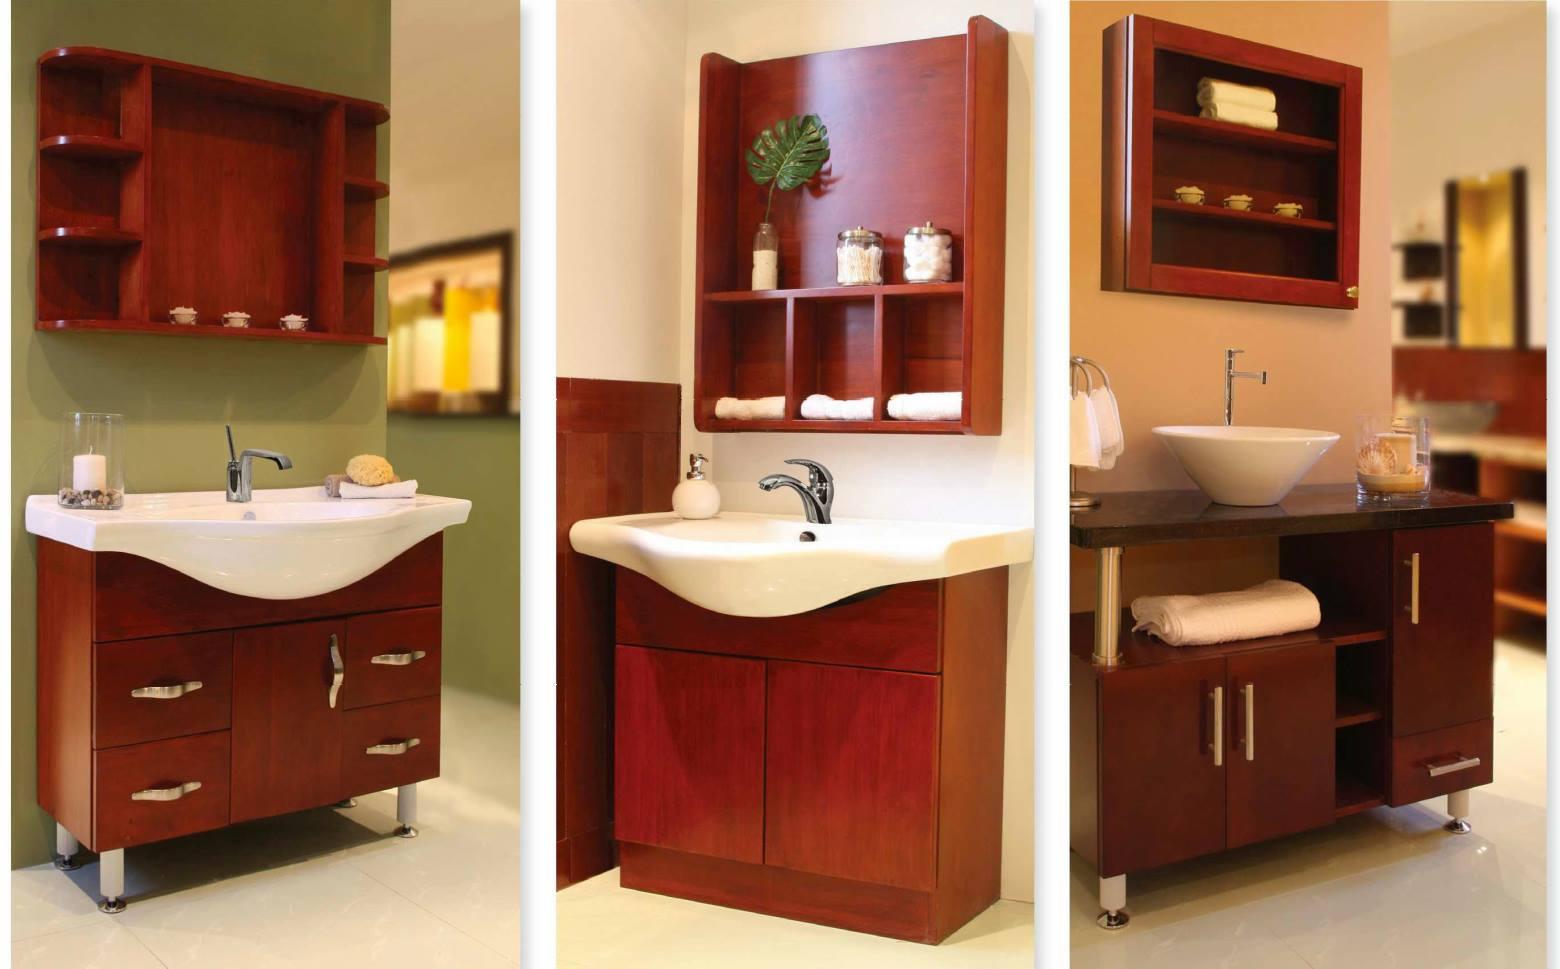 Panda Kitchen Bath 3250 Nw 77th Ct Doral Fl 33122 Yp Com